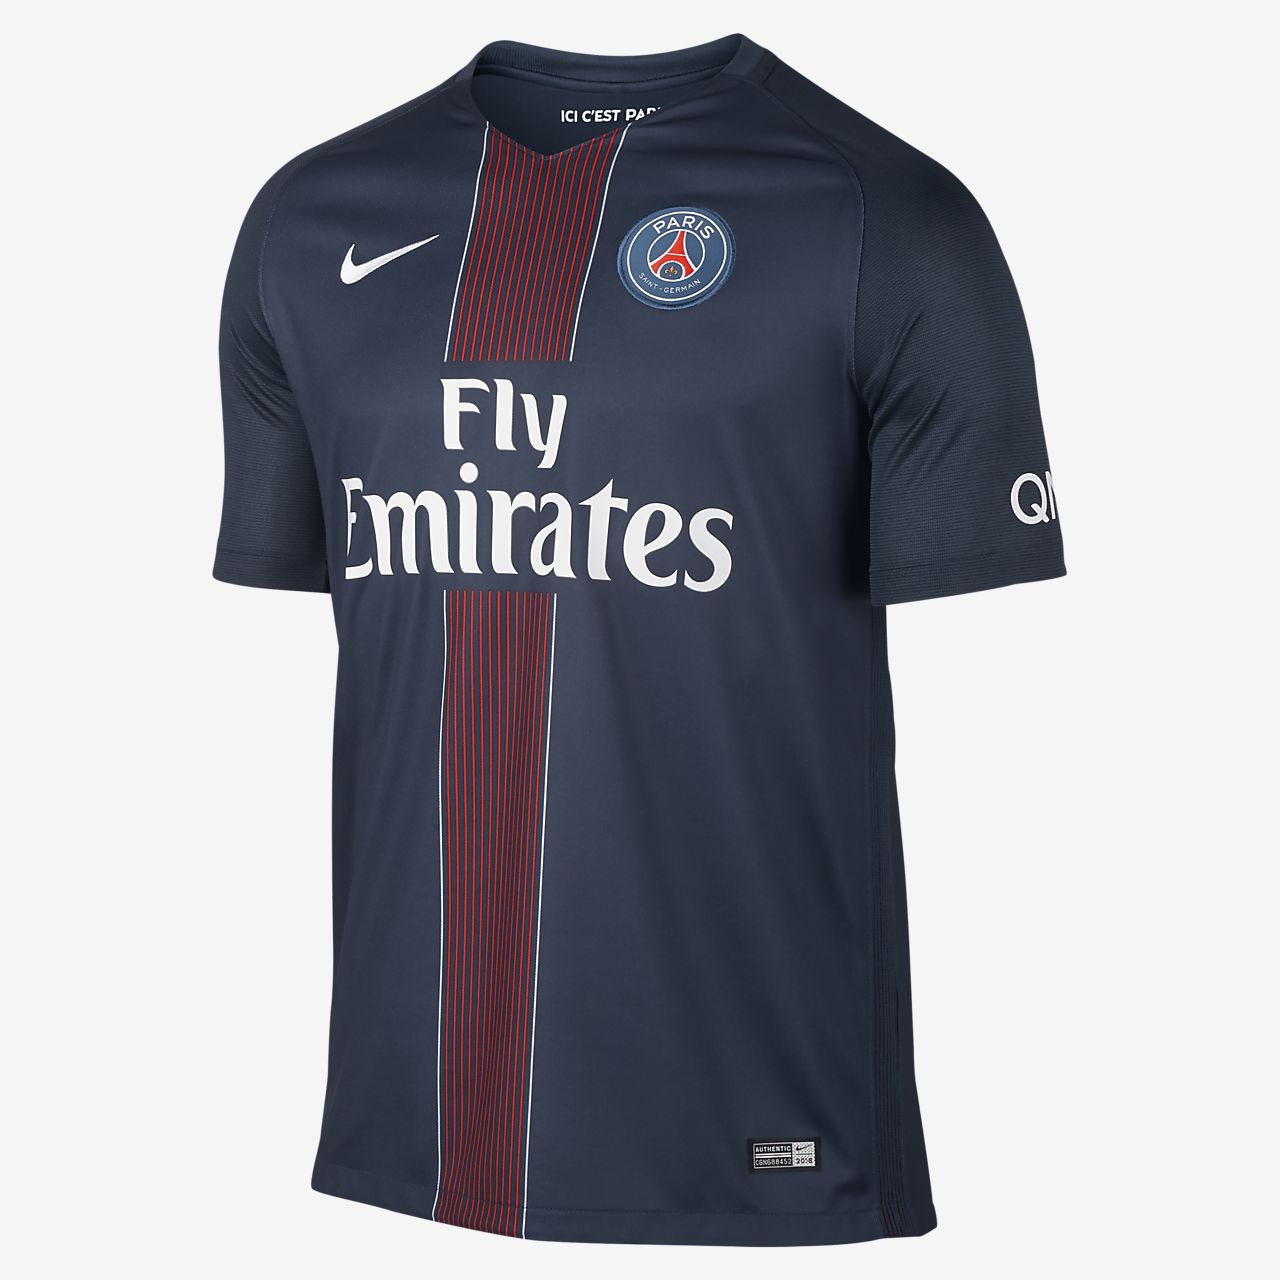 2016/17 Paris Saint-Germain Stadium Home Herren-Fußballshirt